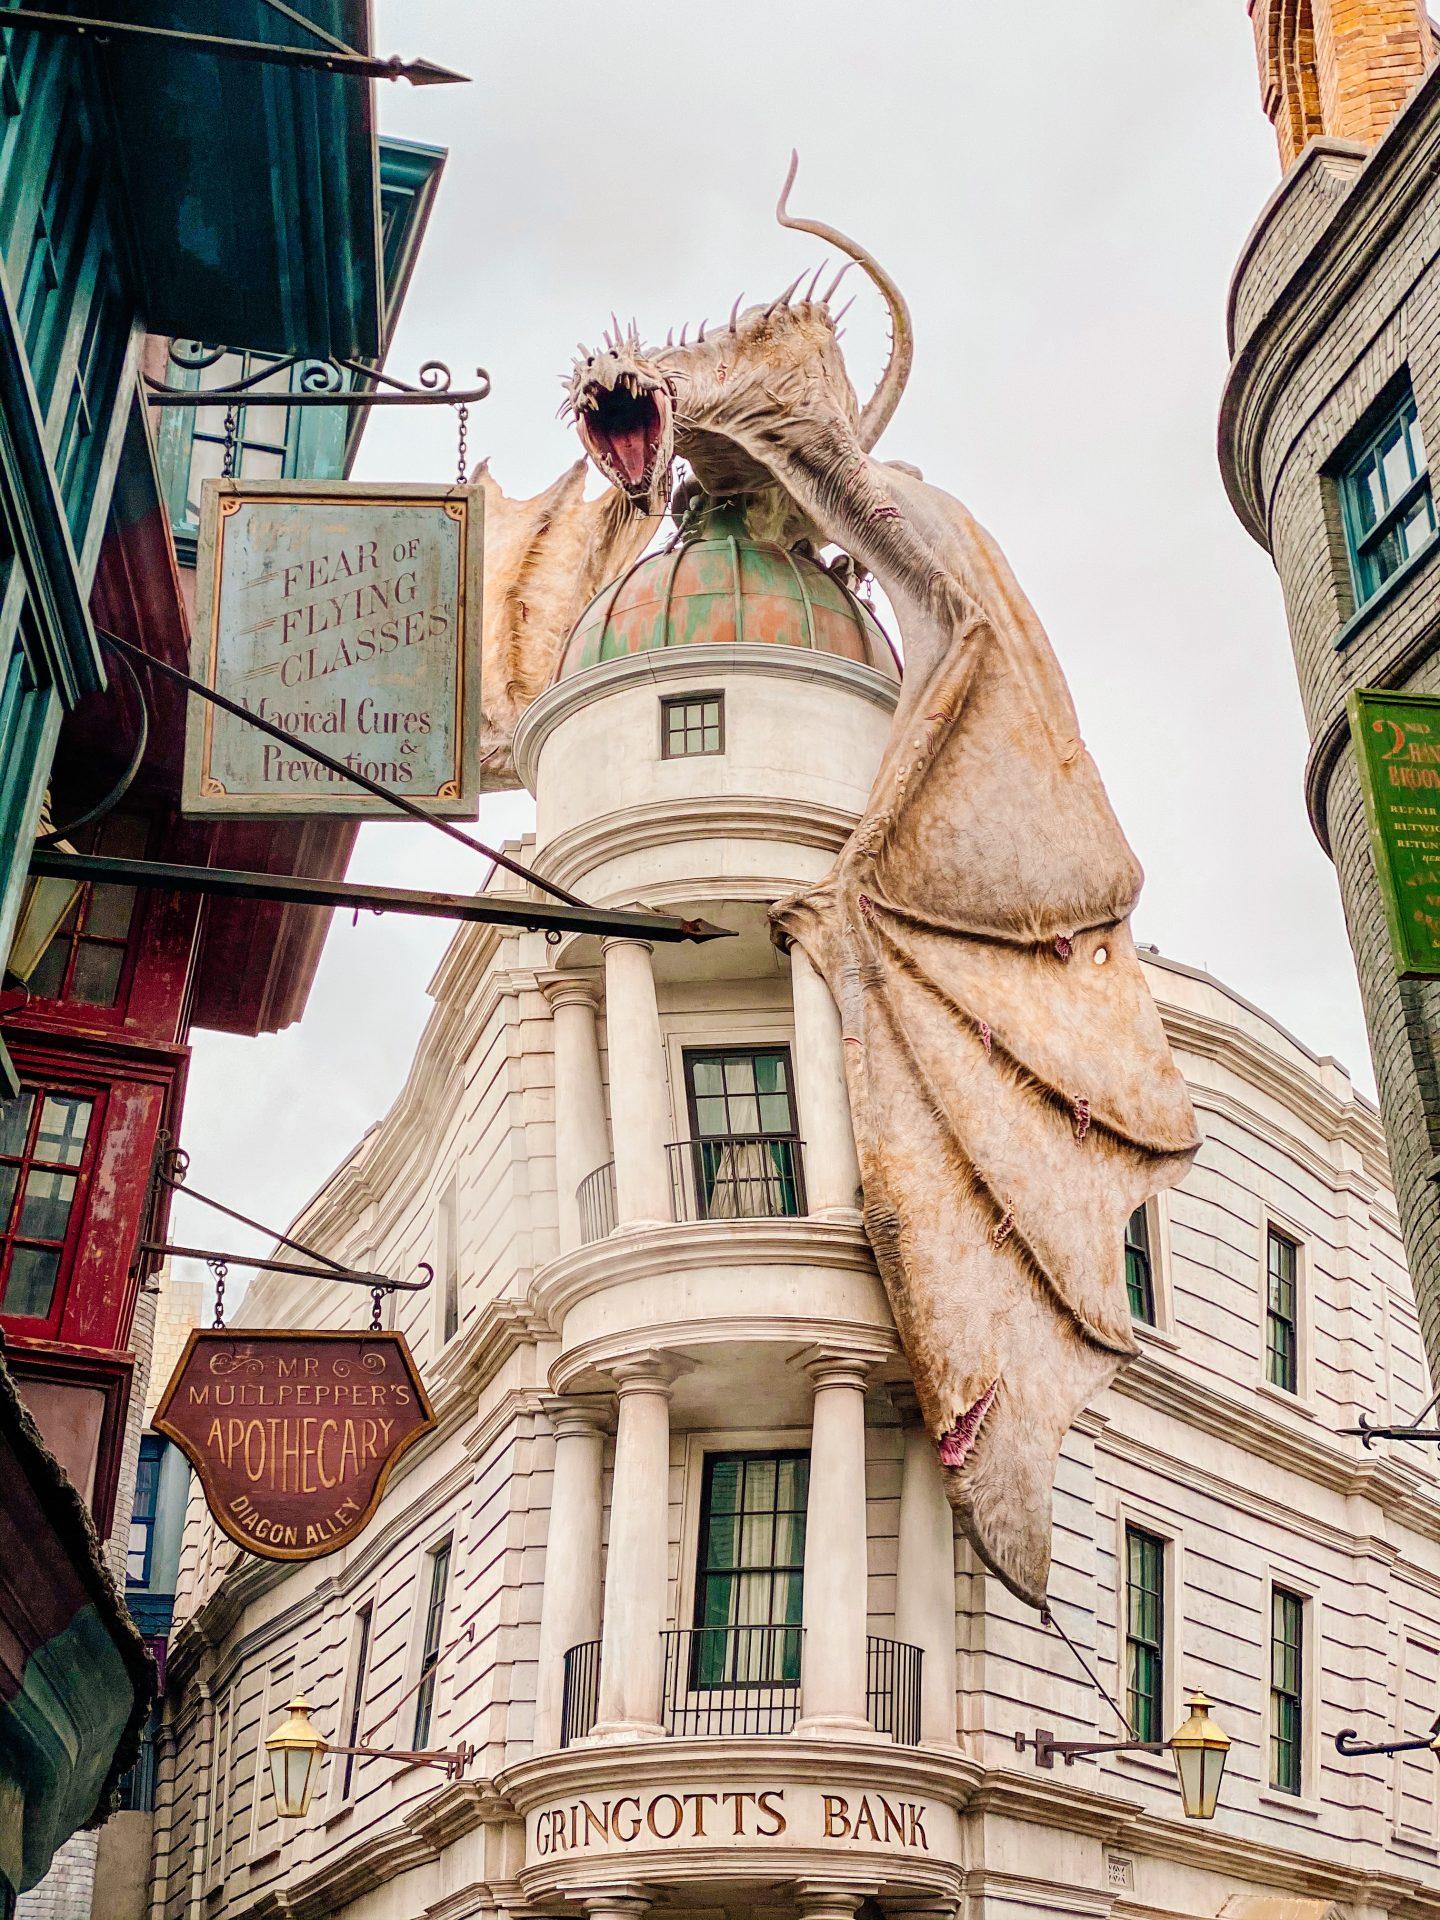 dragon on top of gringotts bank in diagon alley at universal studios orlando florida